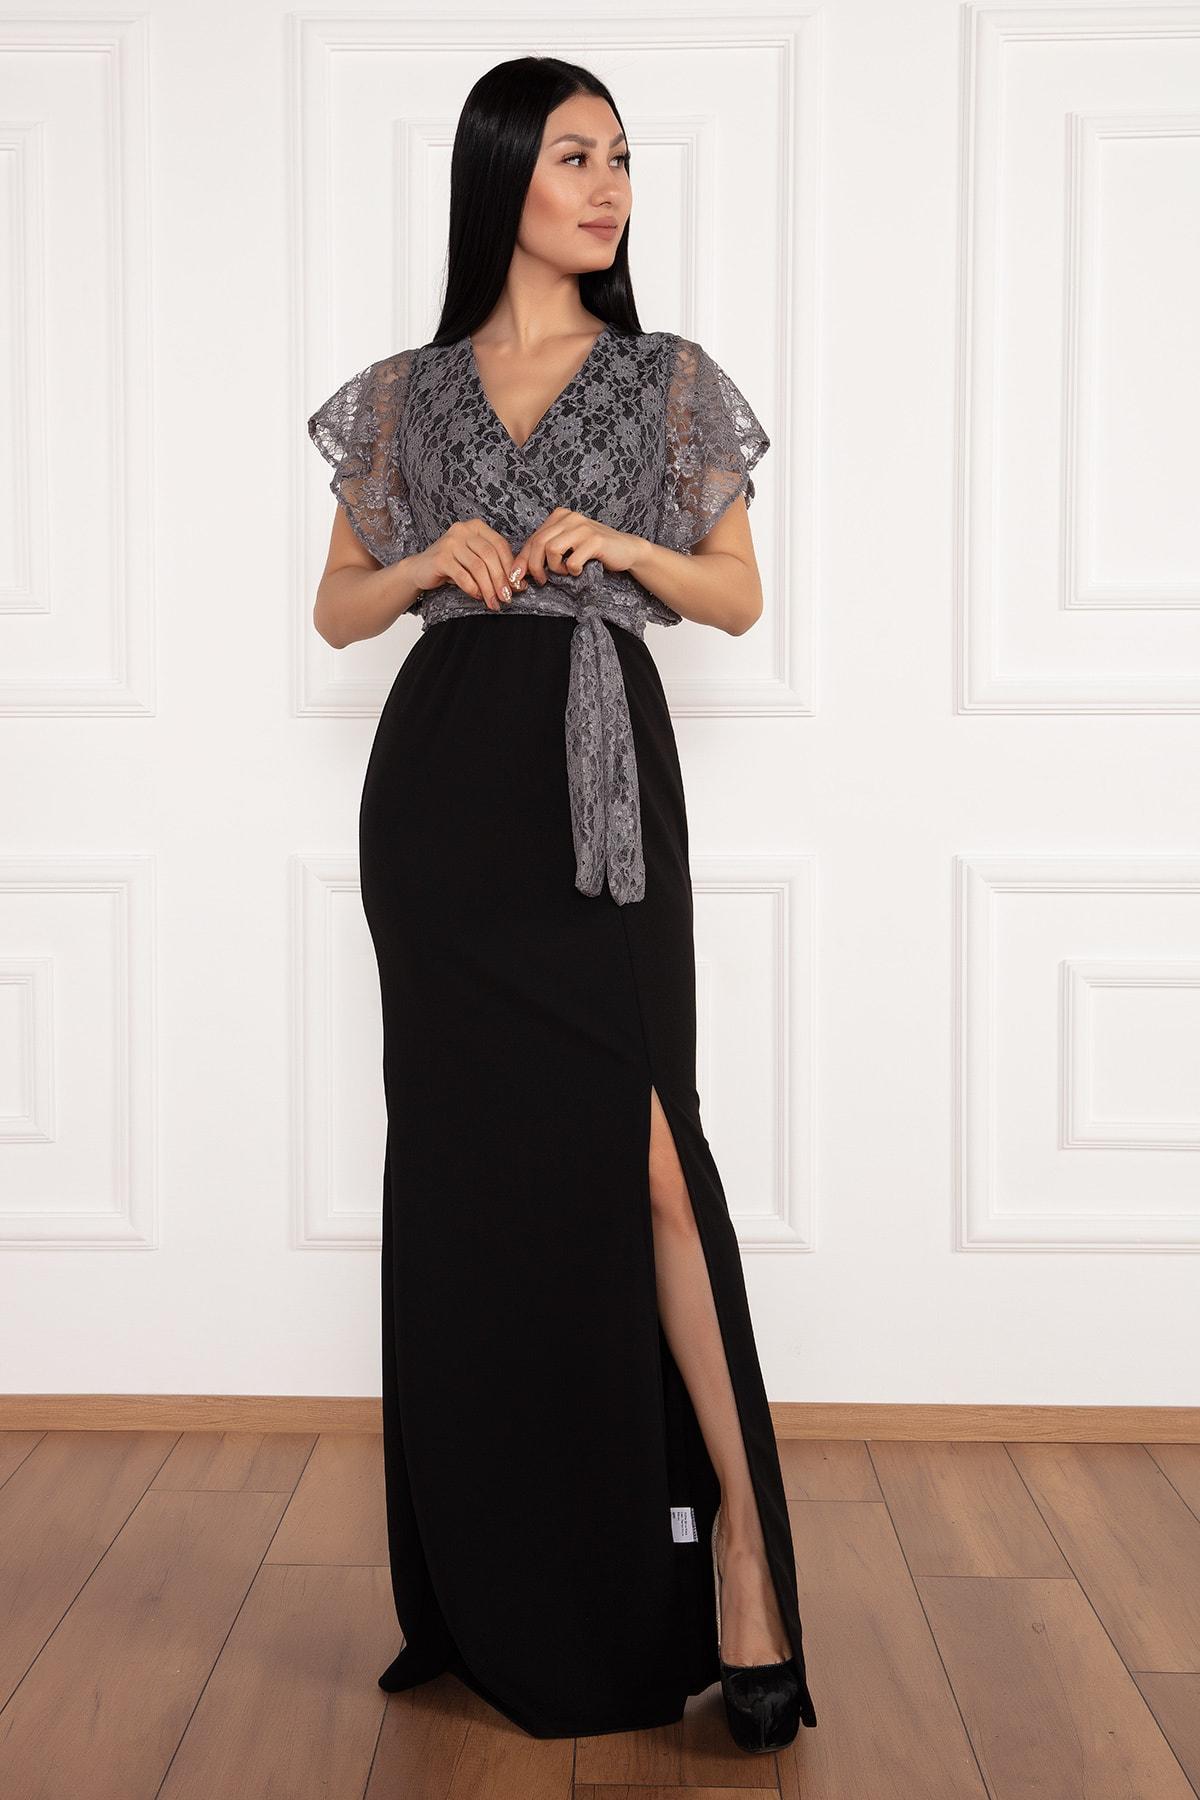 PULLIMM Olive 13214 Krep Üstü Dantel Uzun Elbise 1